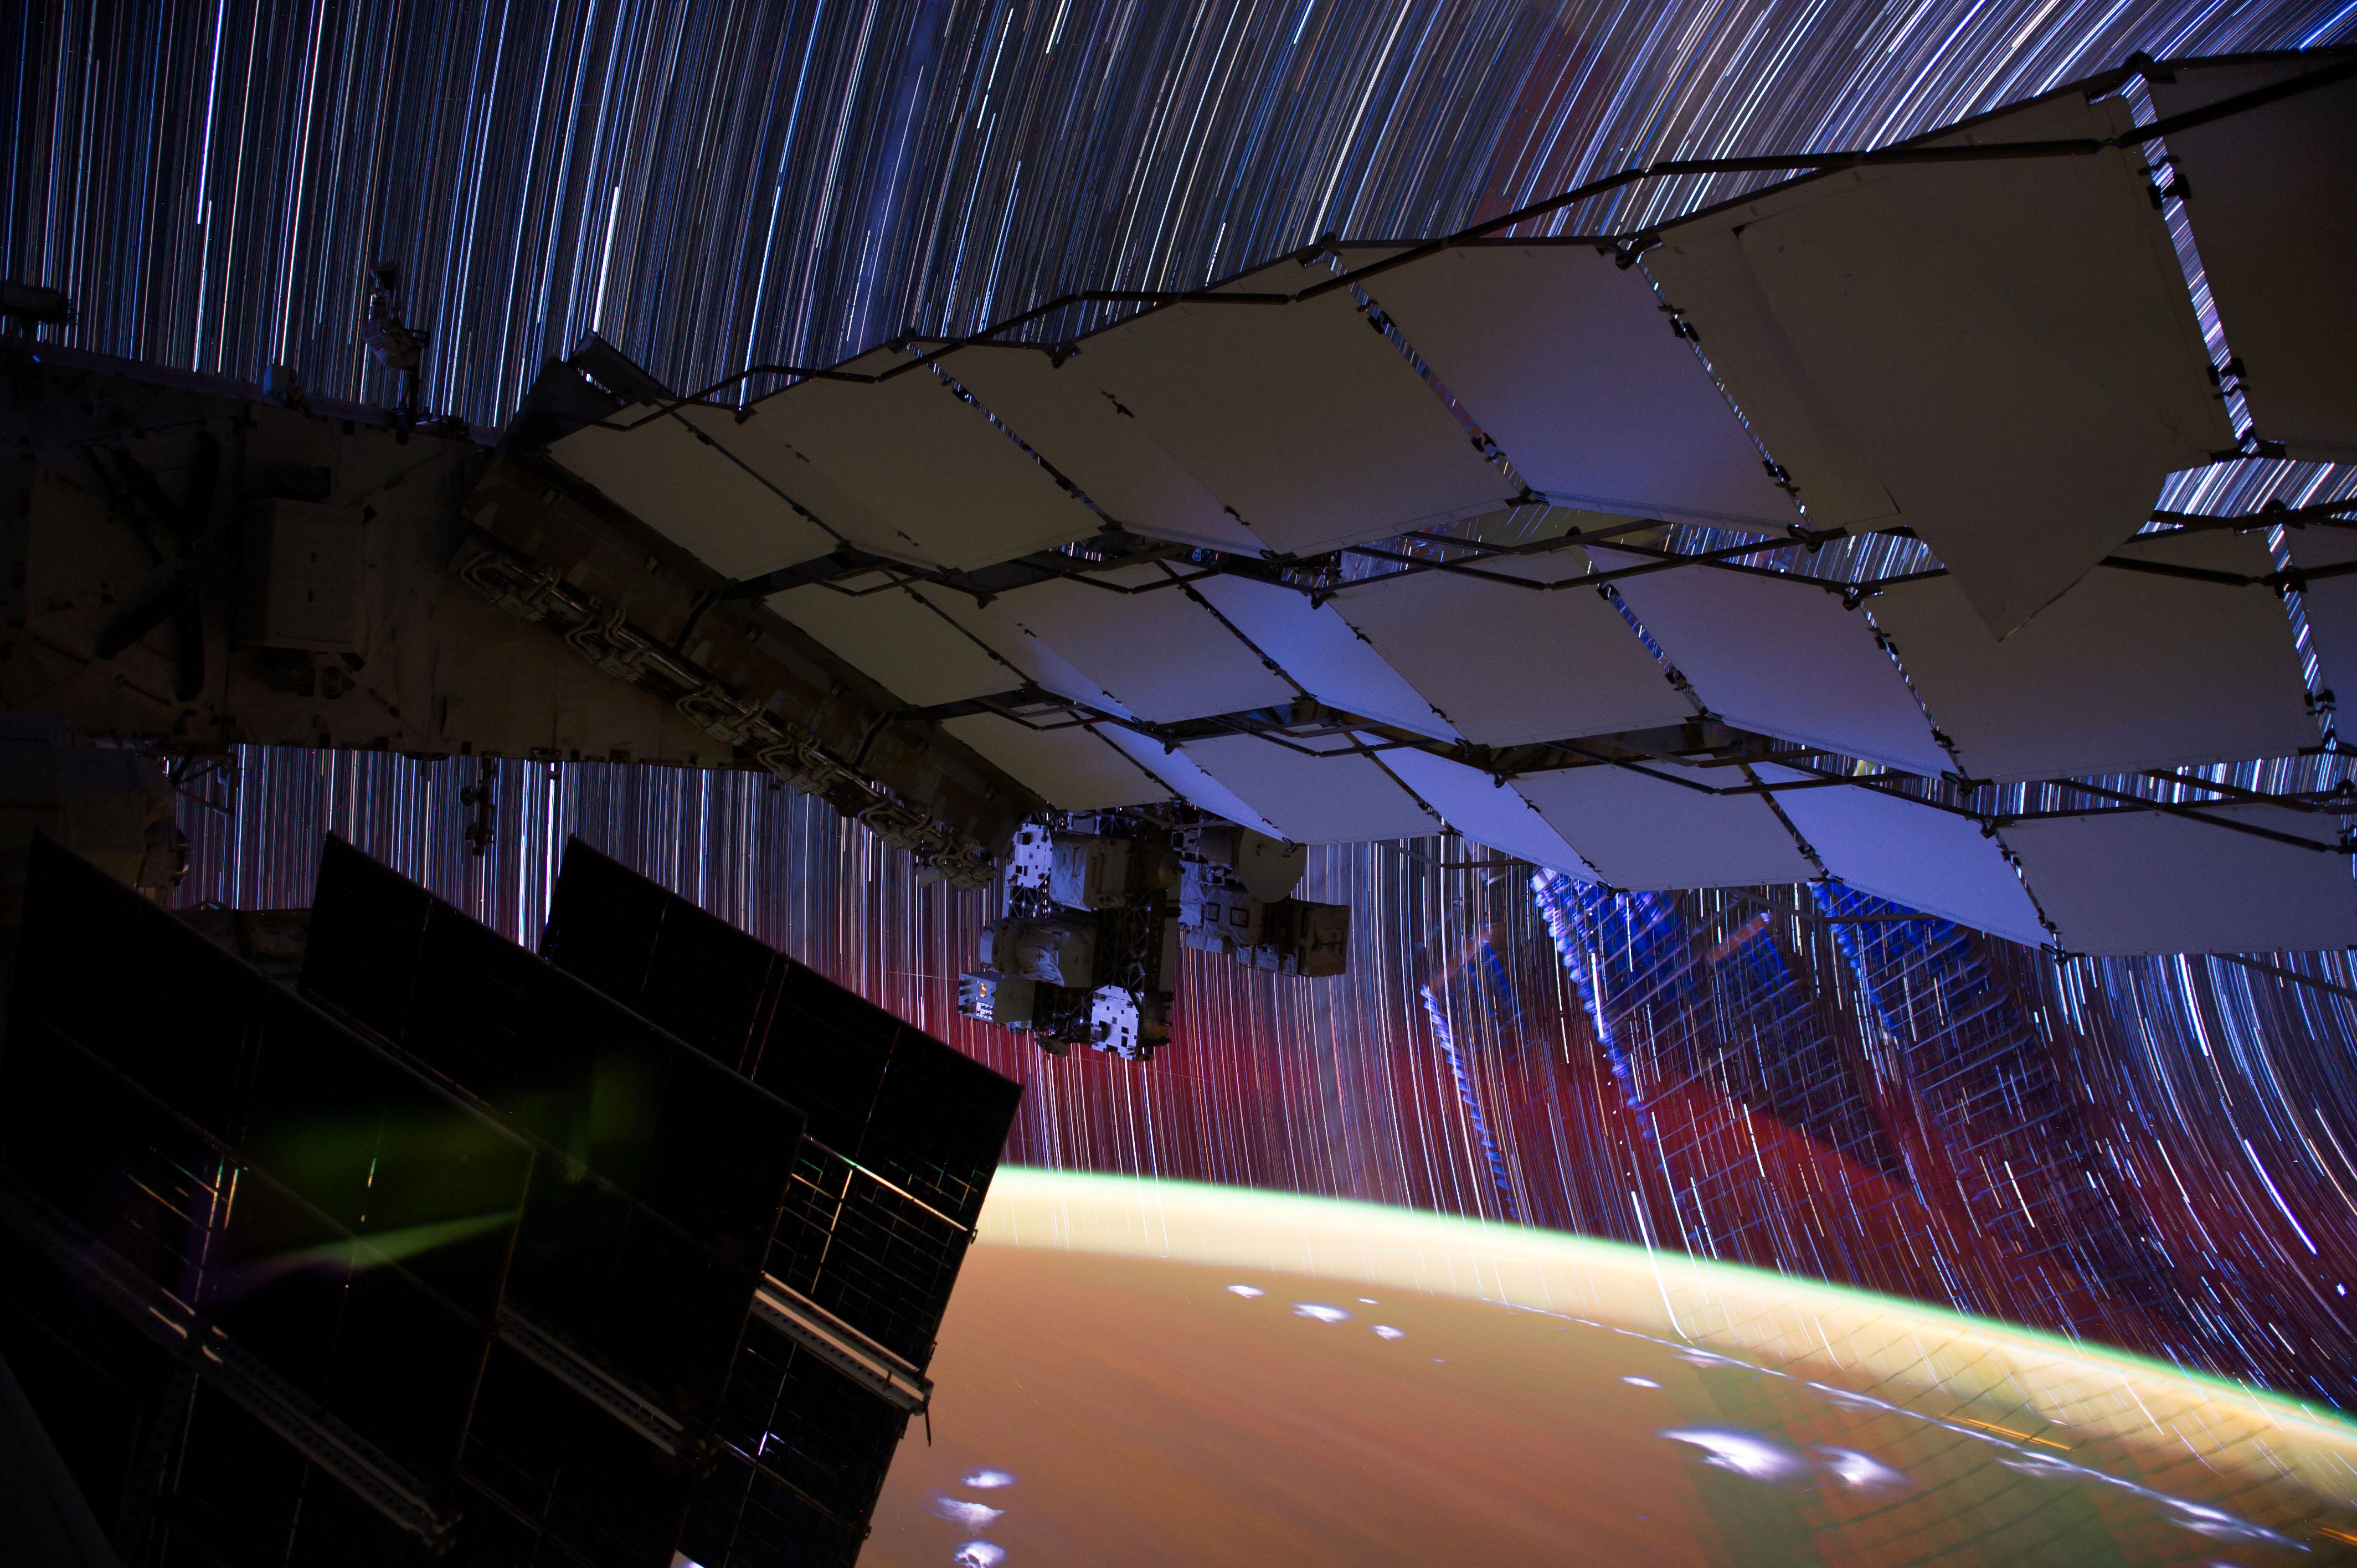 Star trail composite